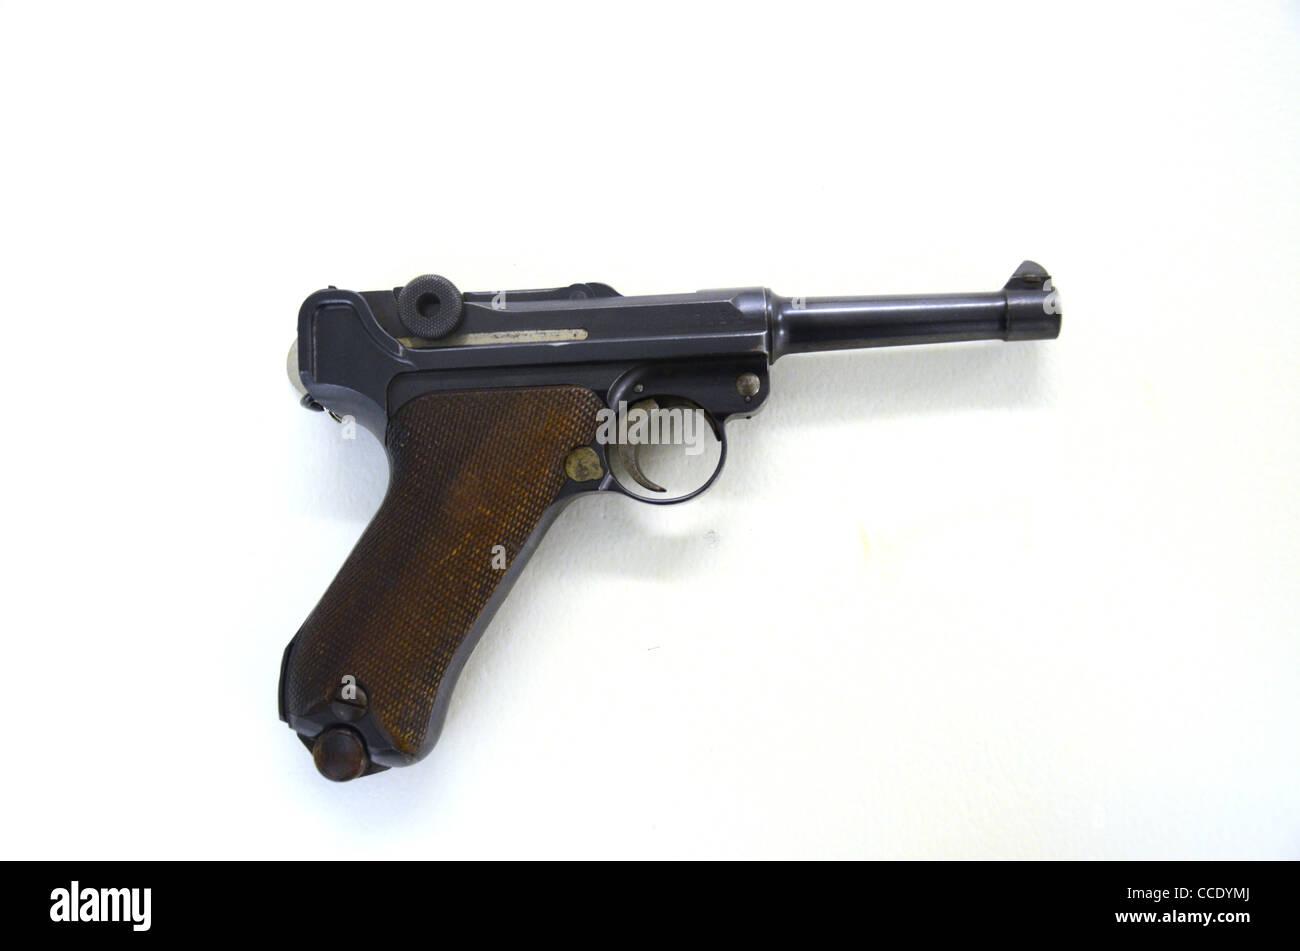 ARMSLIST - For Sale: Beretta 92F Parabellum